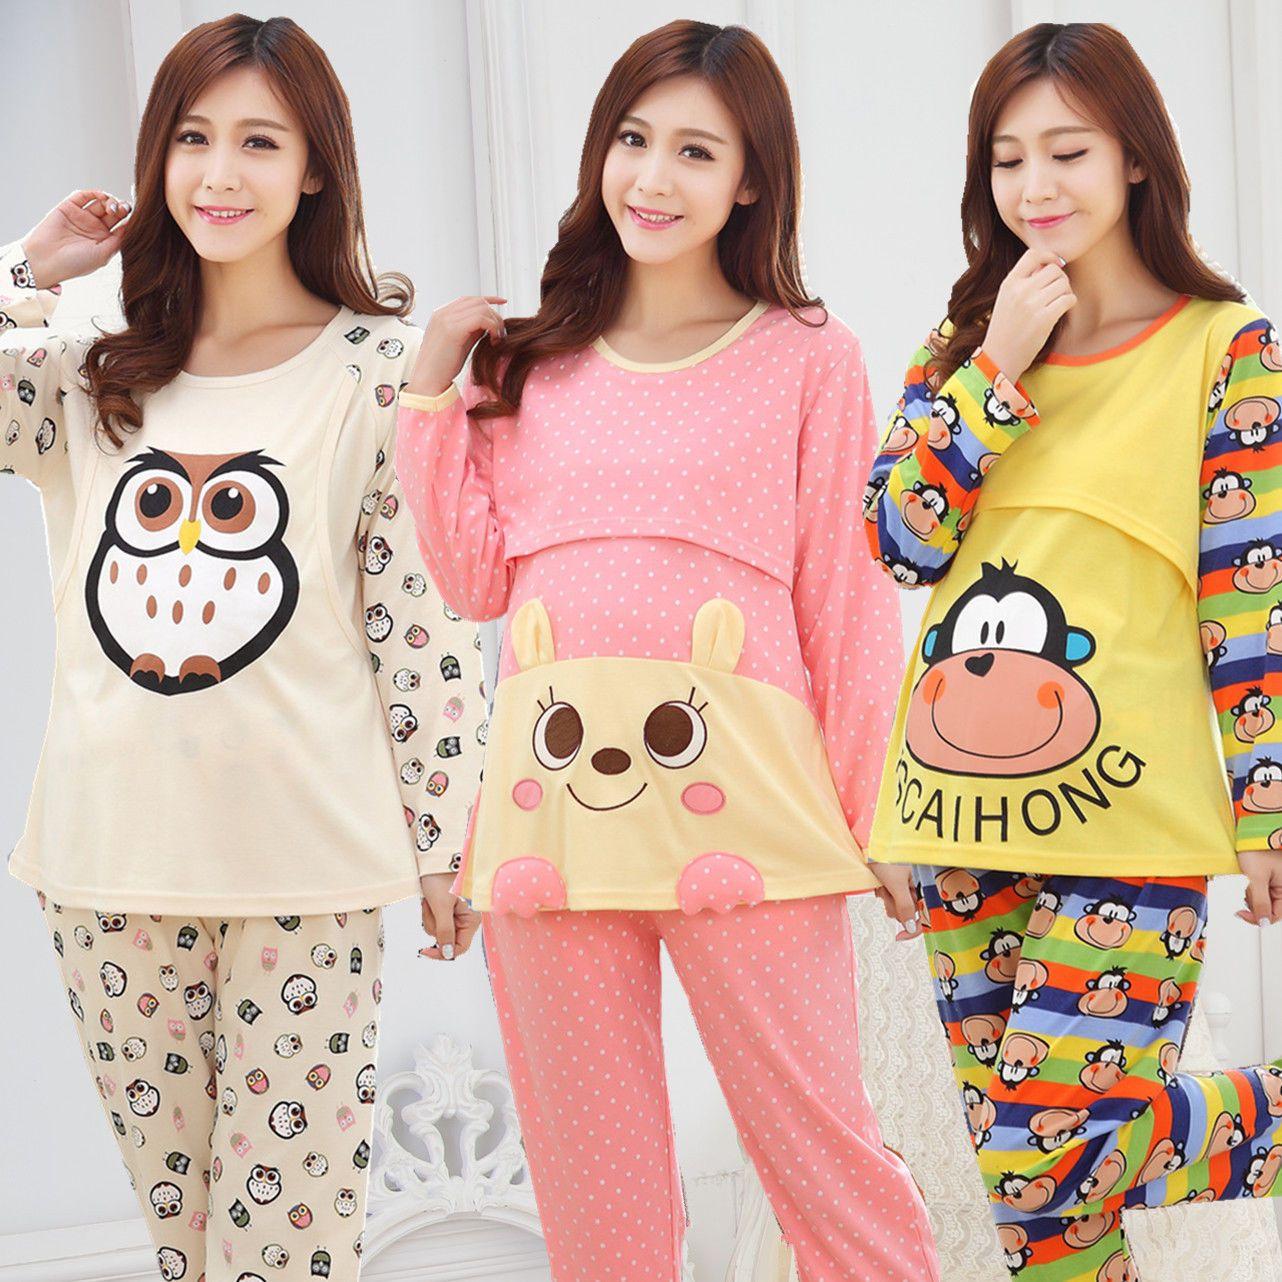 e174780c8b71f New Cute Autumn Winter Pregnant Women Sleepwear Cotton Maternity Nursing  Pajama | eBay